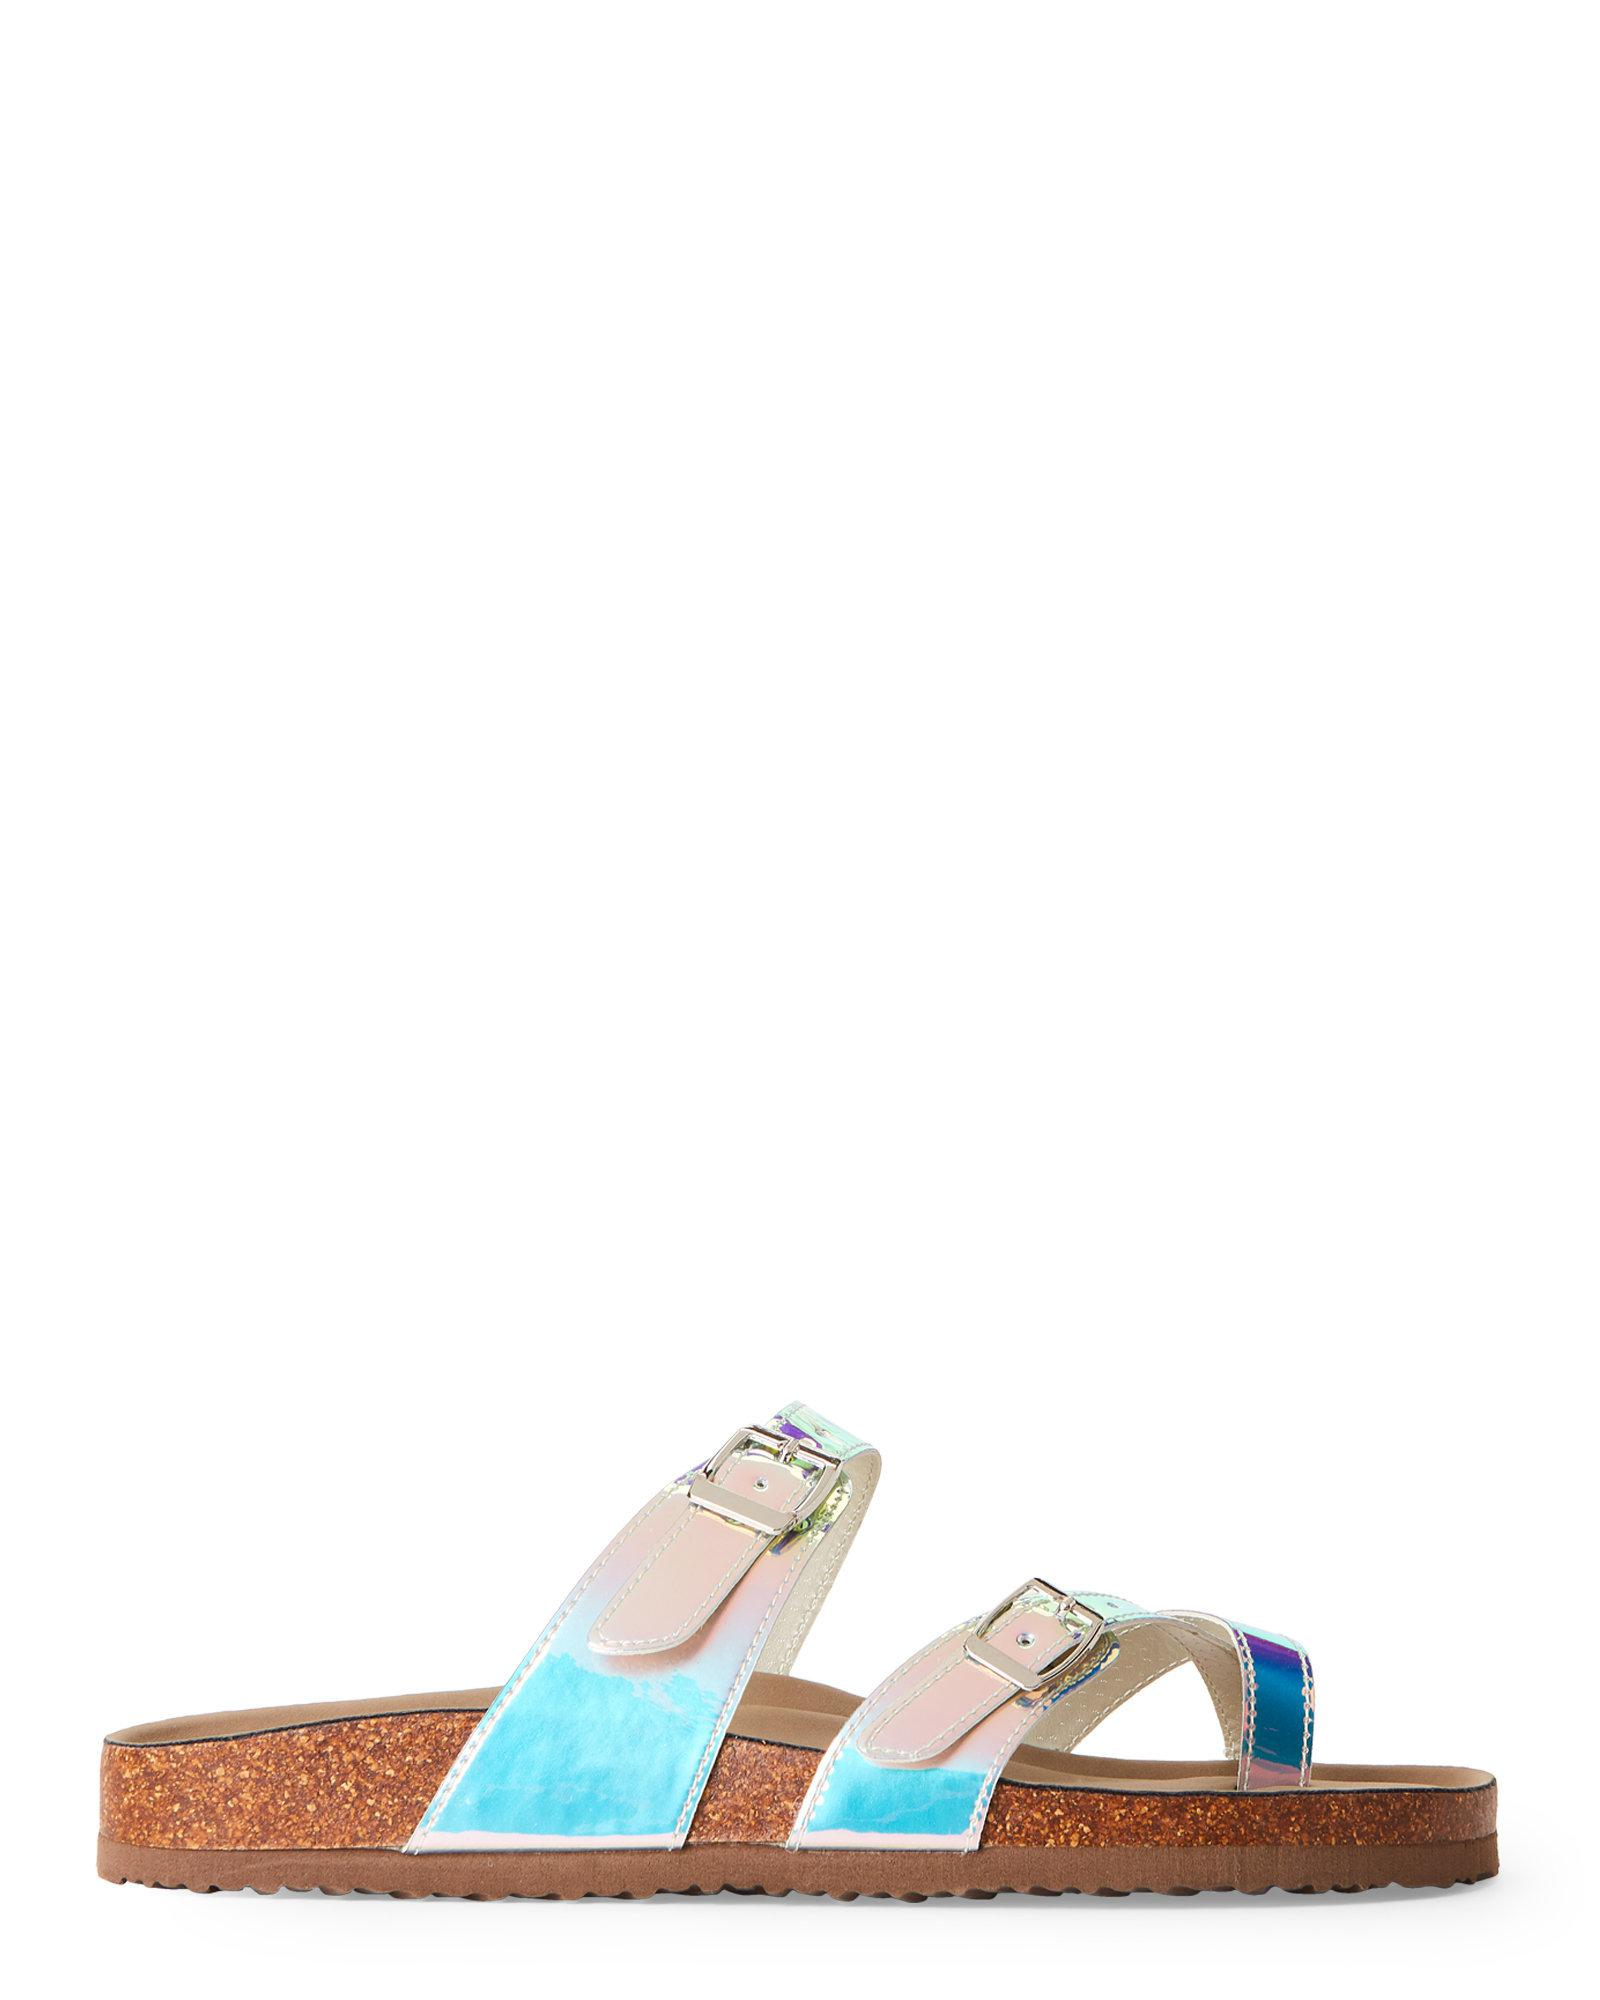 c7ed6cb2fe4d68 Lyst - Madden Girl Iridescent Bryceee Footbed Sandals